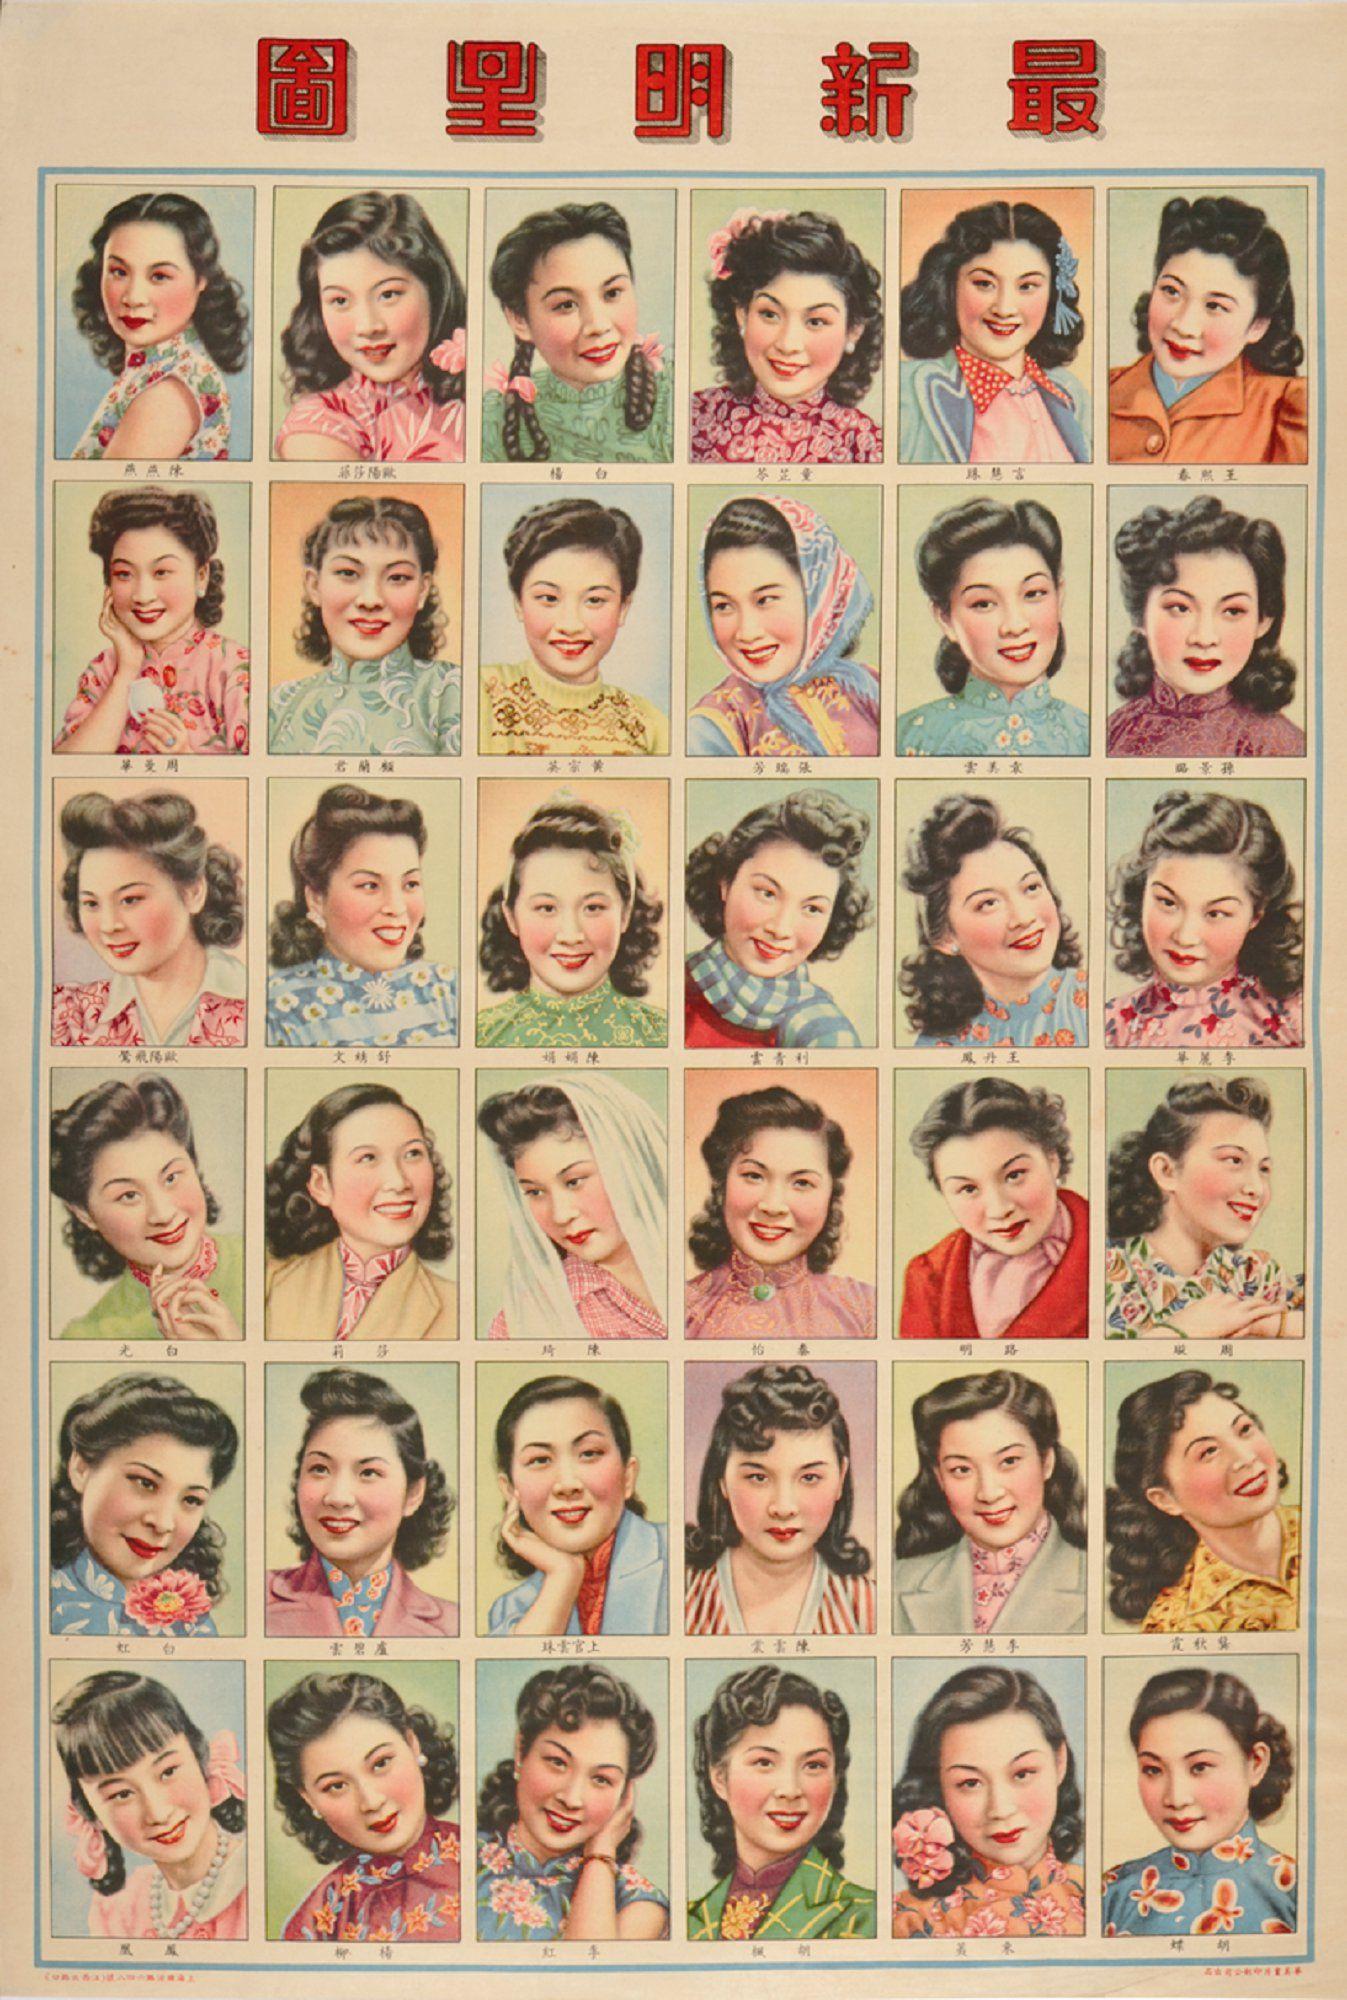 Shanghai Lifestyle Vintage Hairstyles Fashion Poster Diagram Beauty